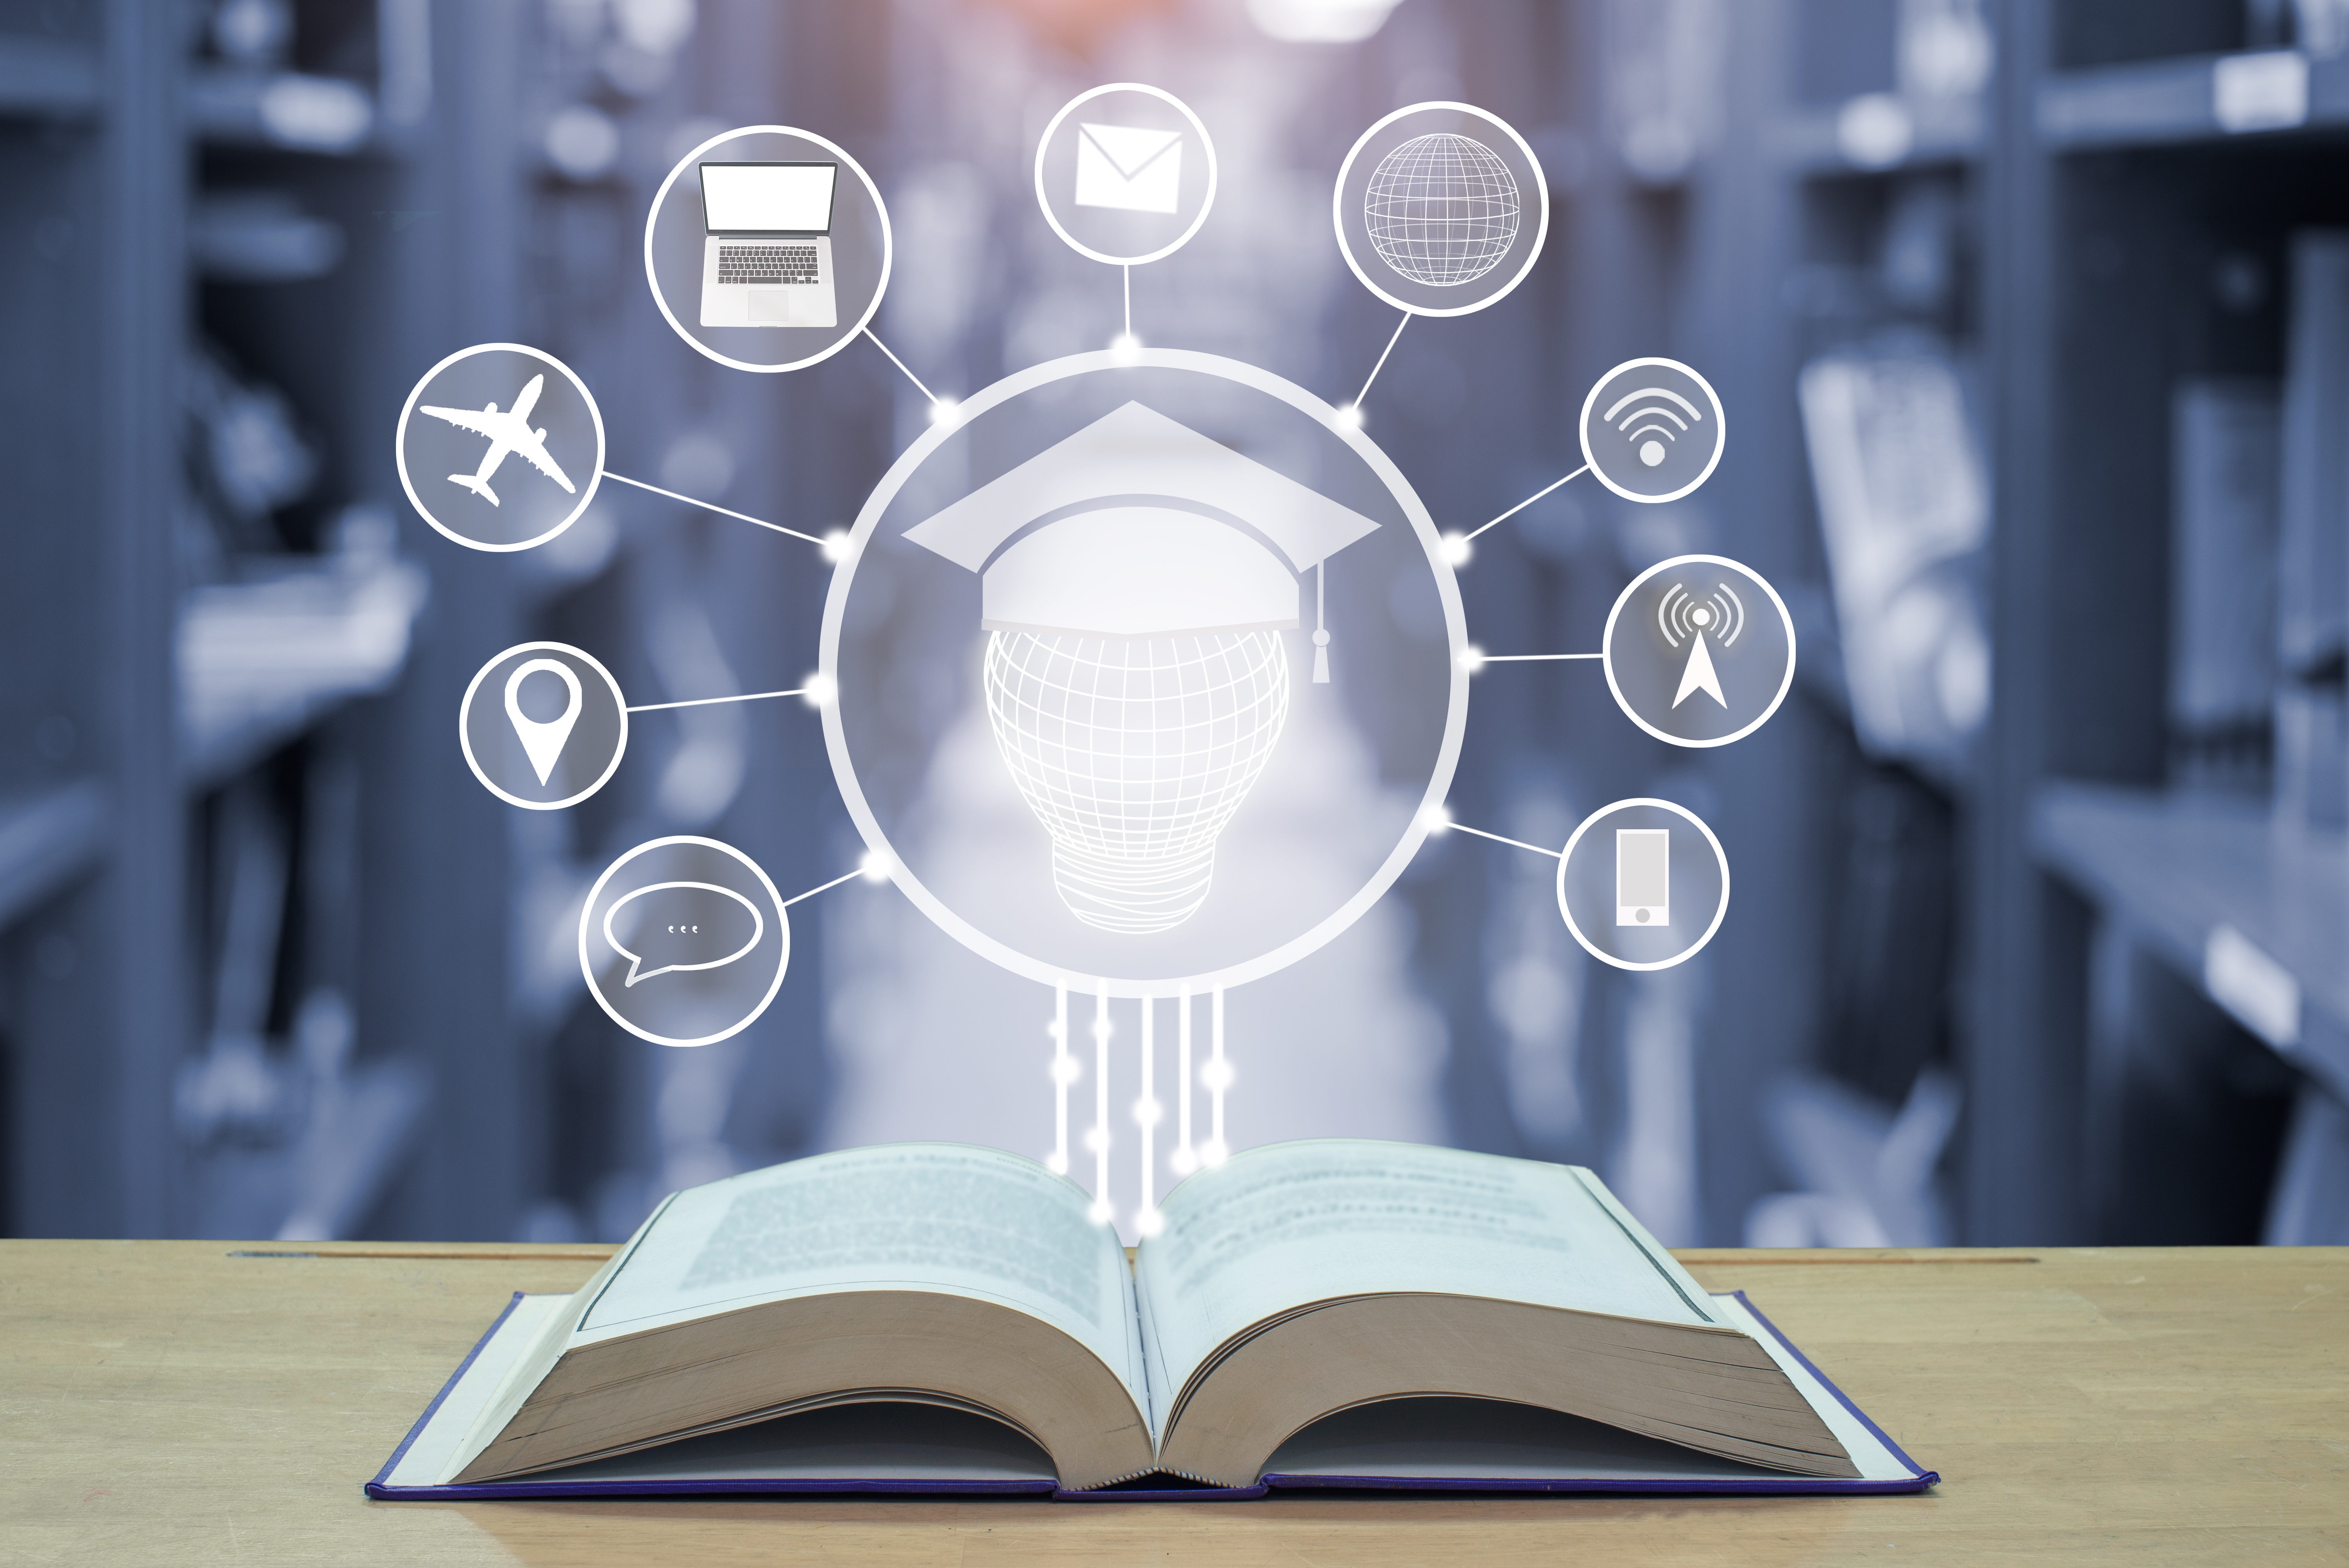 cybersecurity awareness training markets